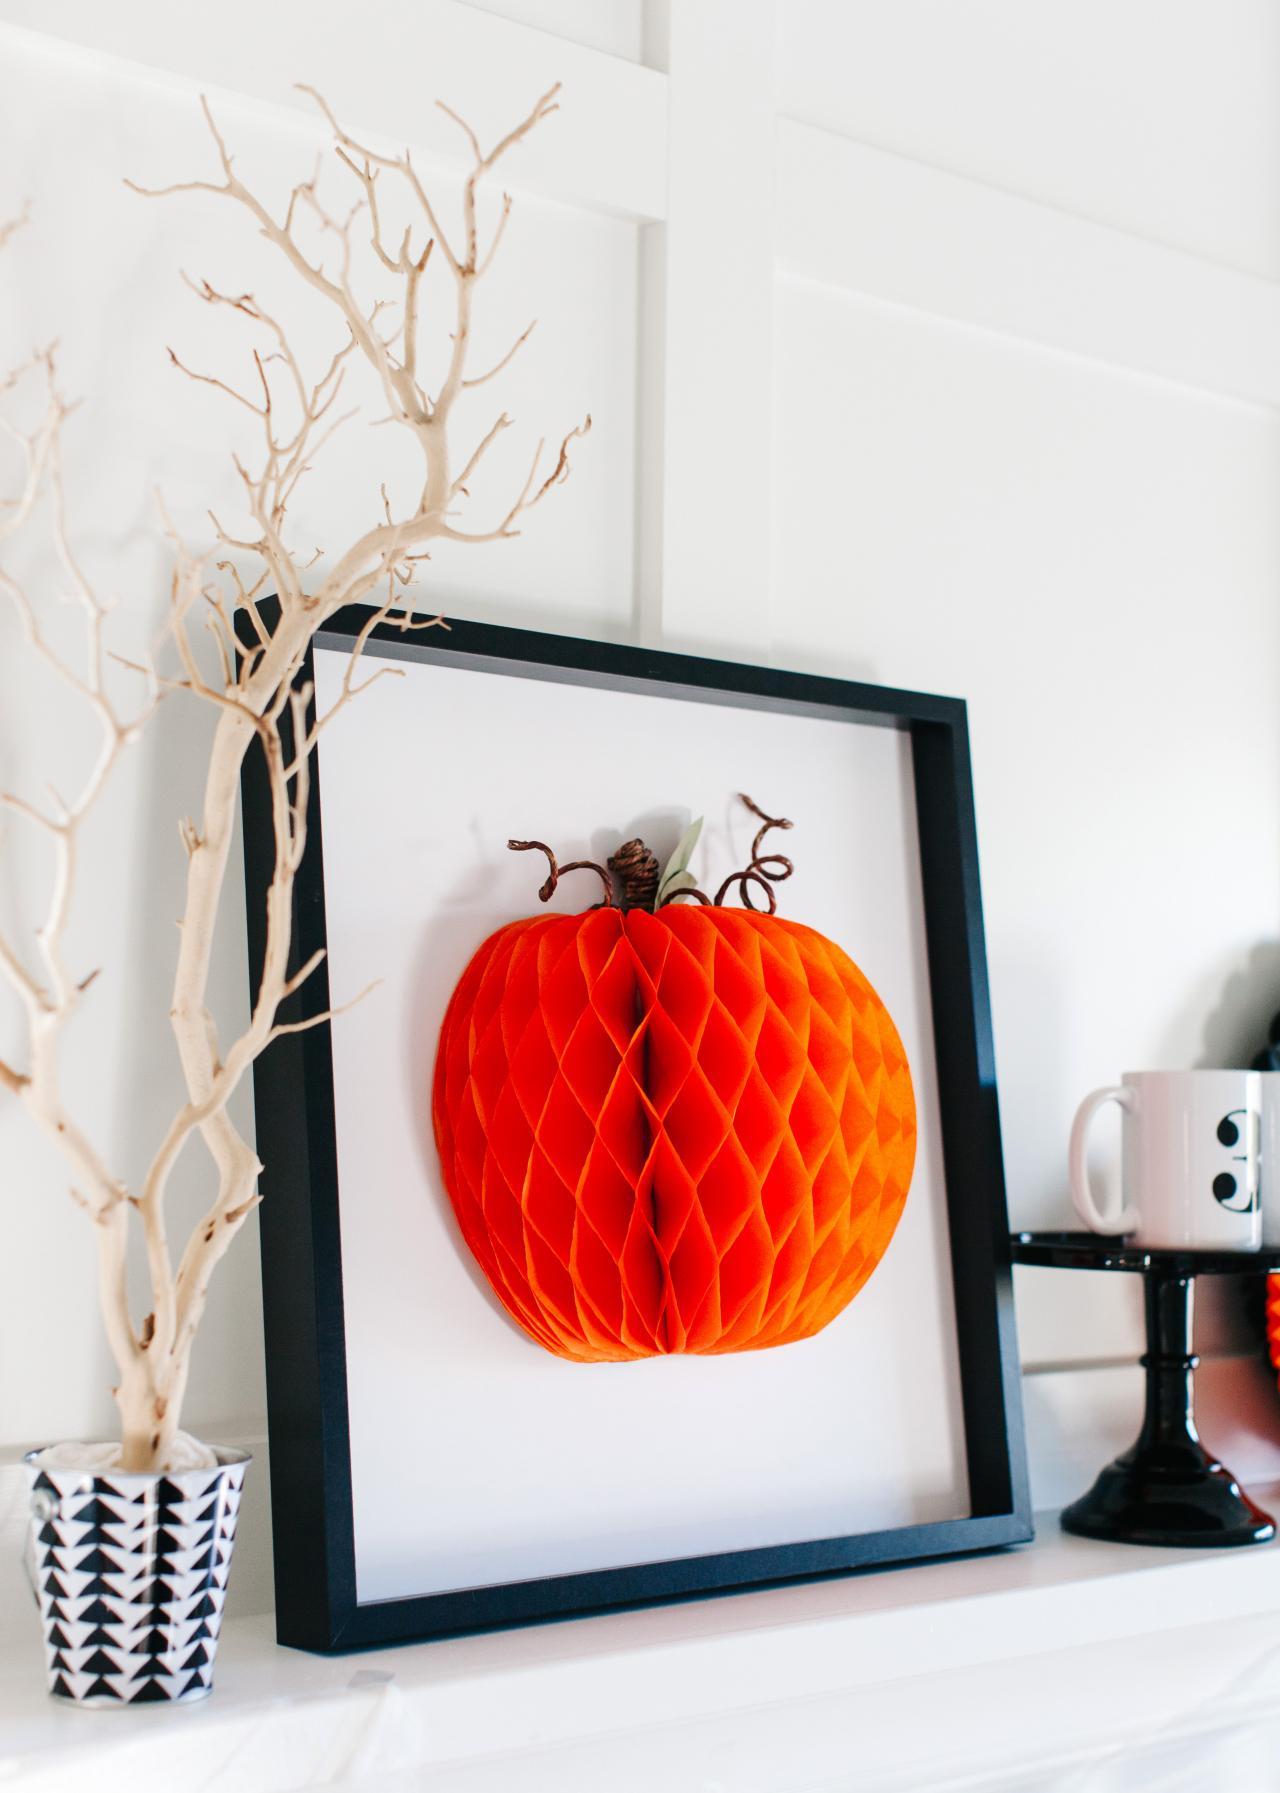 Halloween Decorating Ideas: How to Make 3D Pumpkin Art | how-tos | DIY